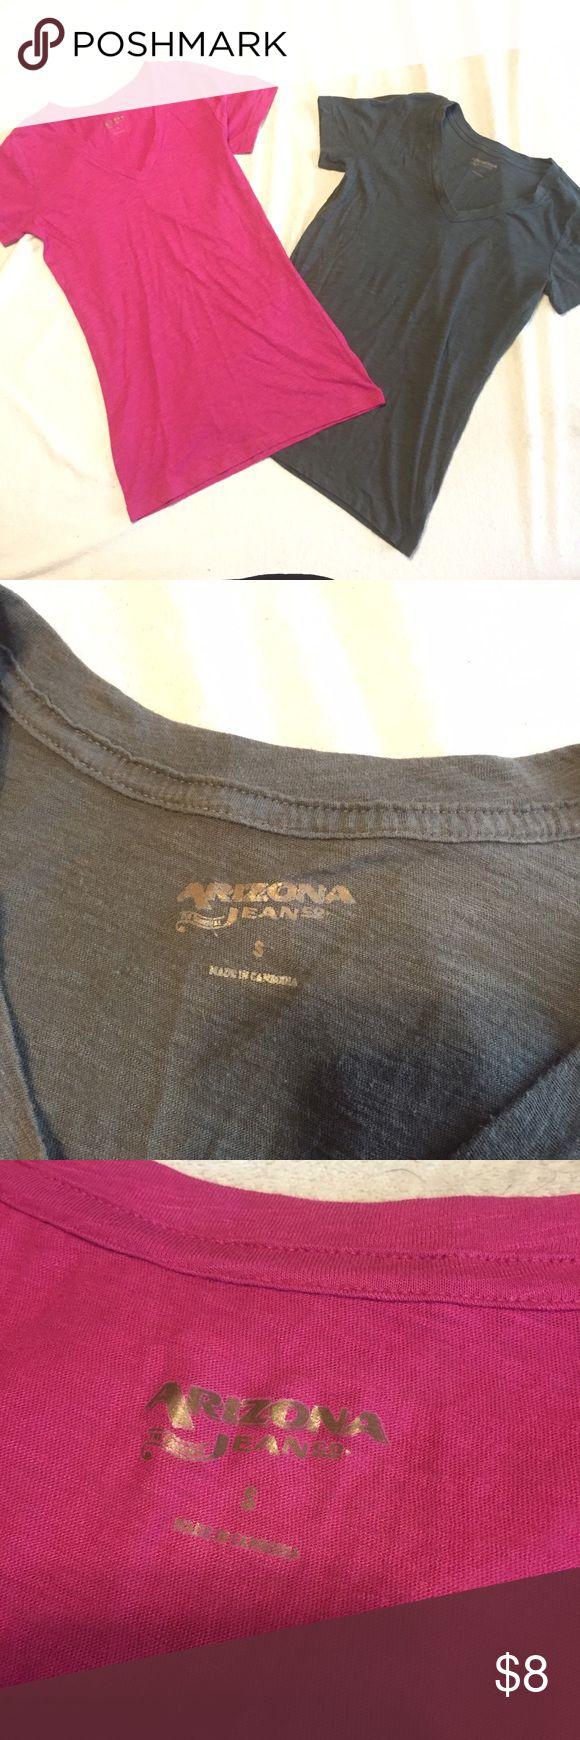 Arizona brand t-shirts Bundle of 2 Arizona brand t-shirts. Both size small. 1 hot pink, 1 gray. Great condition Arizona Jean Company Tops Tees - Short Sleeve